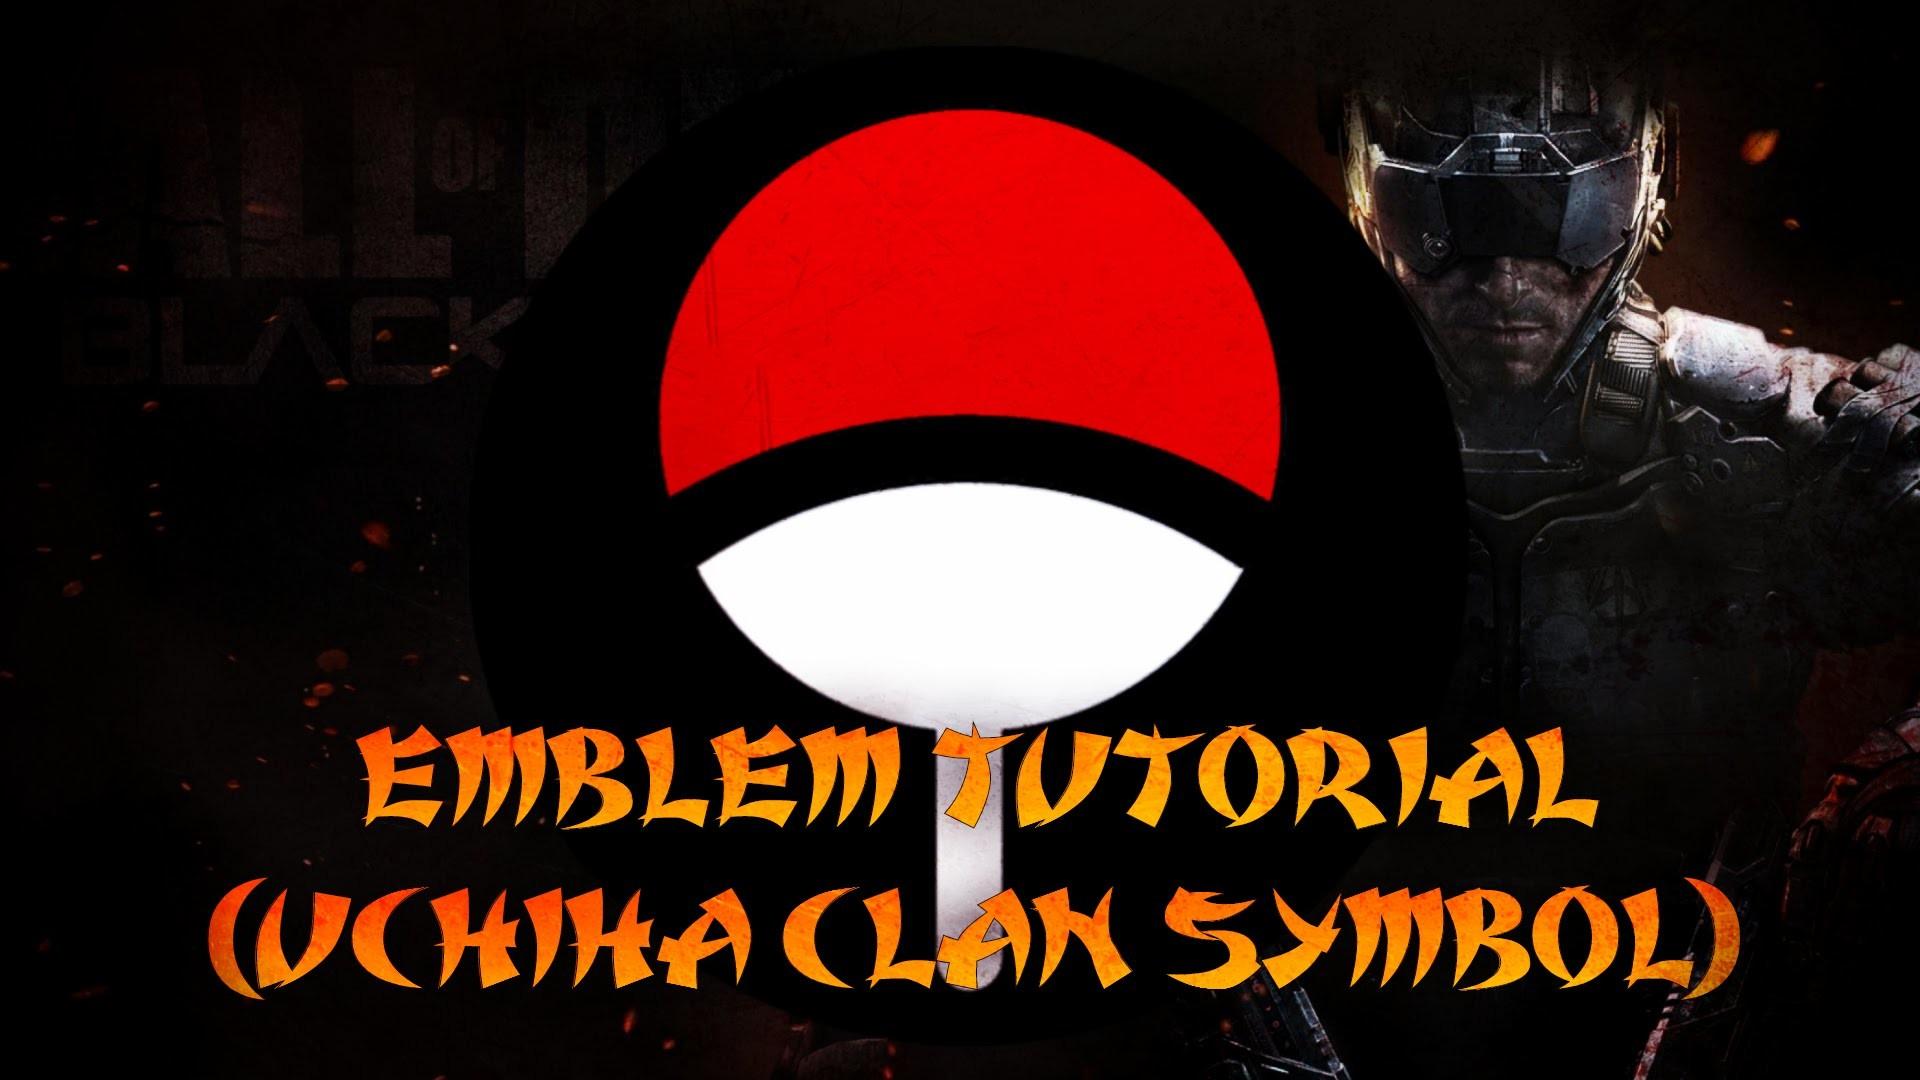 INFINITE WARFARE/BO3 EMBLEM HOW TO MAKE UCHIHA CLAN SYMBOL !!!! – YouTube